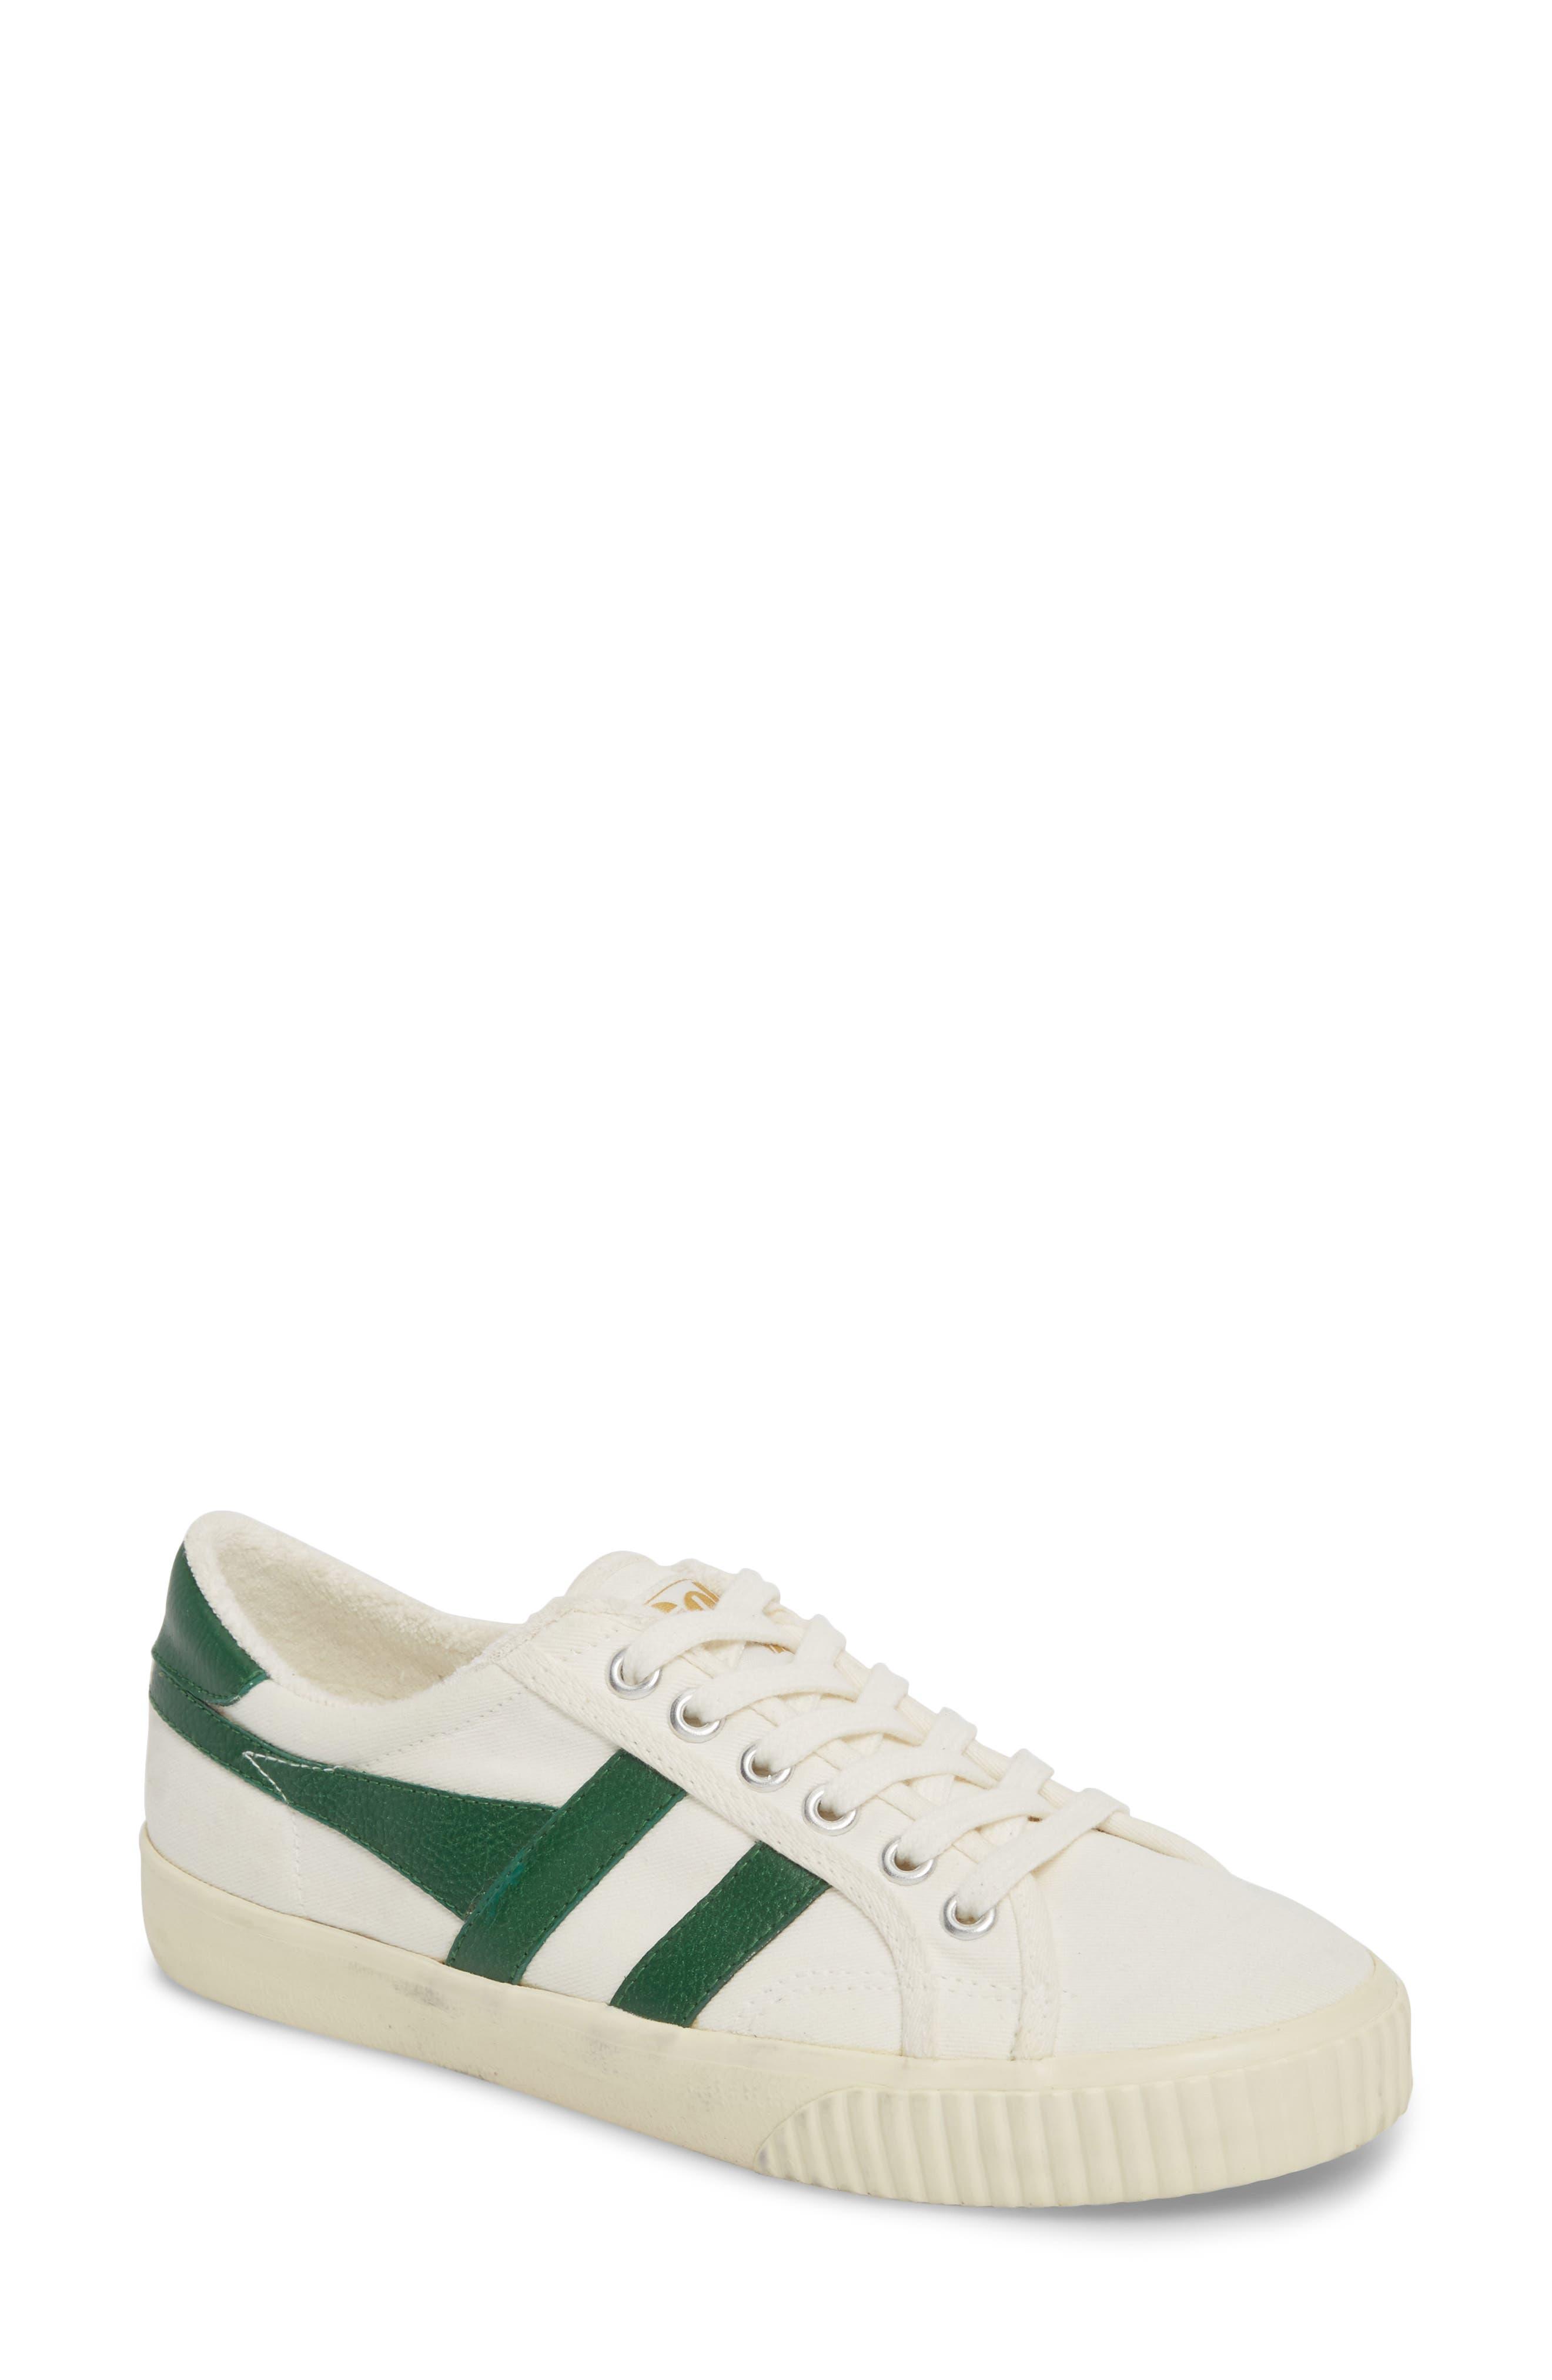 Tennis Mark Cox Sneaker,                             Main thumbnail 1, color,                             Off White/ Green